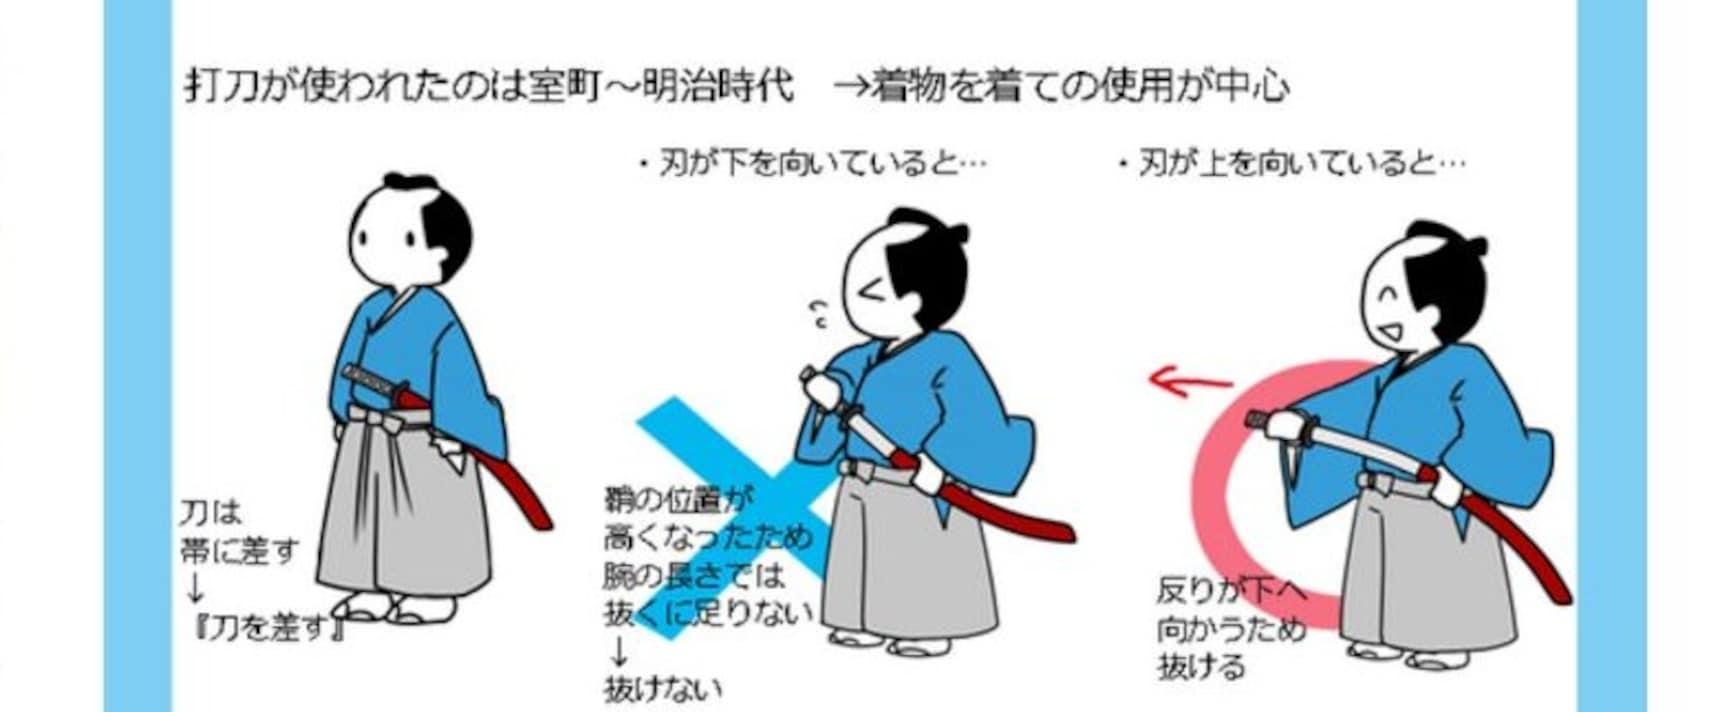 Samurai Guide: How to Wear a Sword